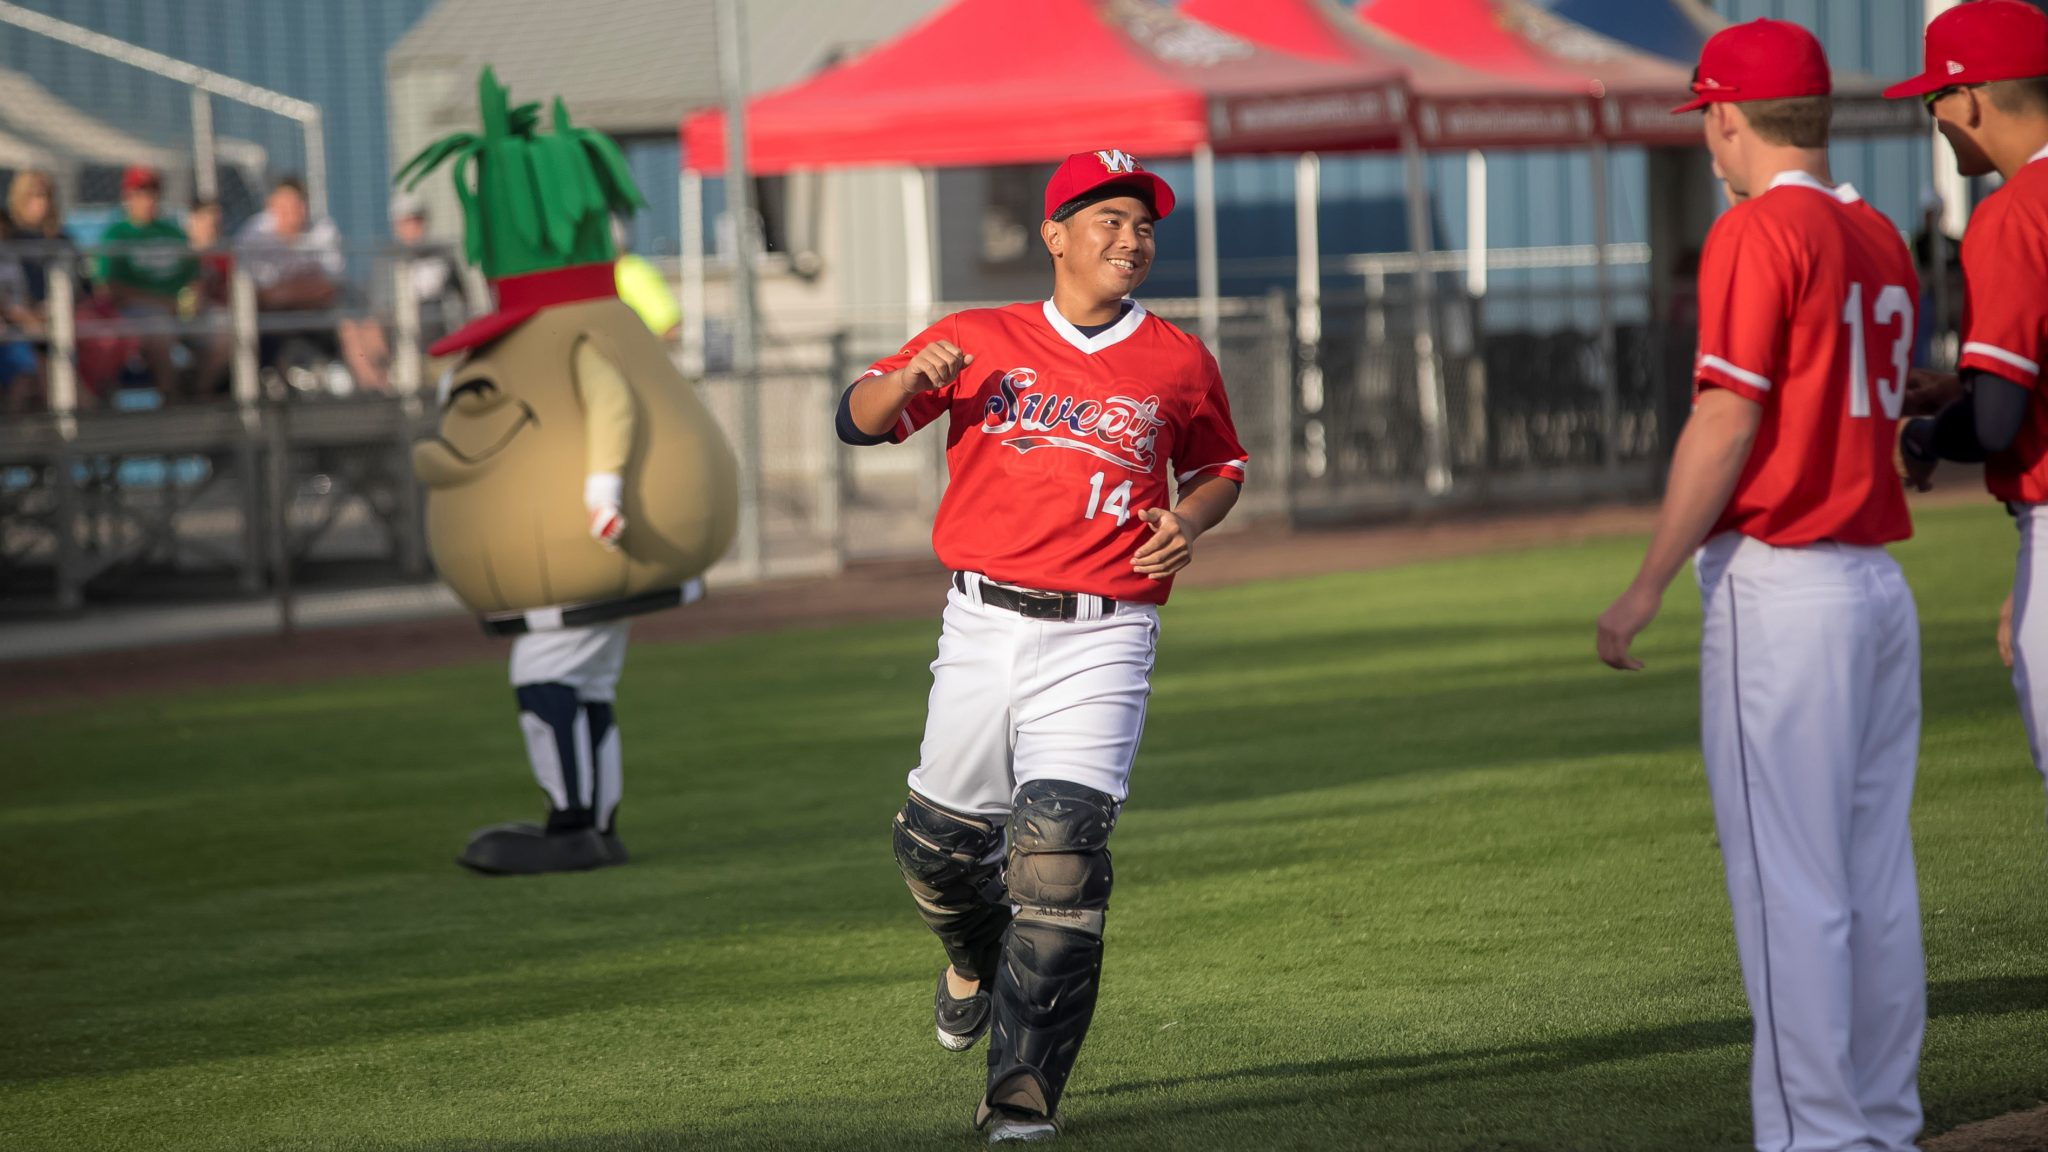 Press Releases - Walla Walla Sweets Baseball